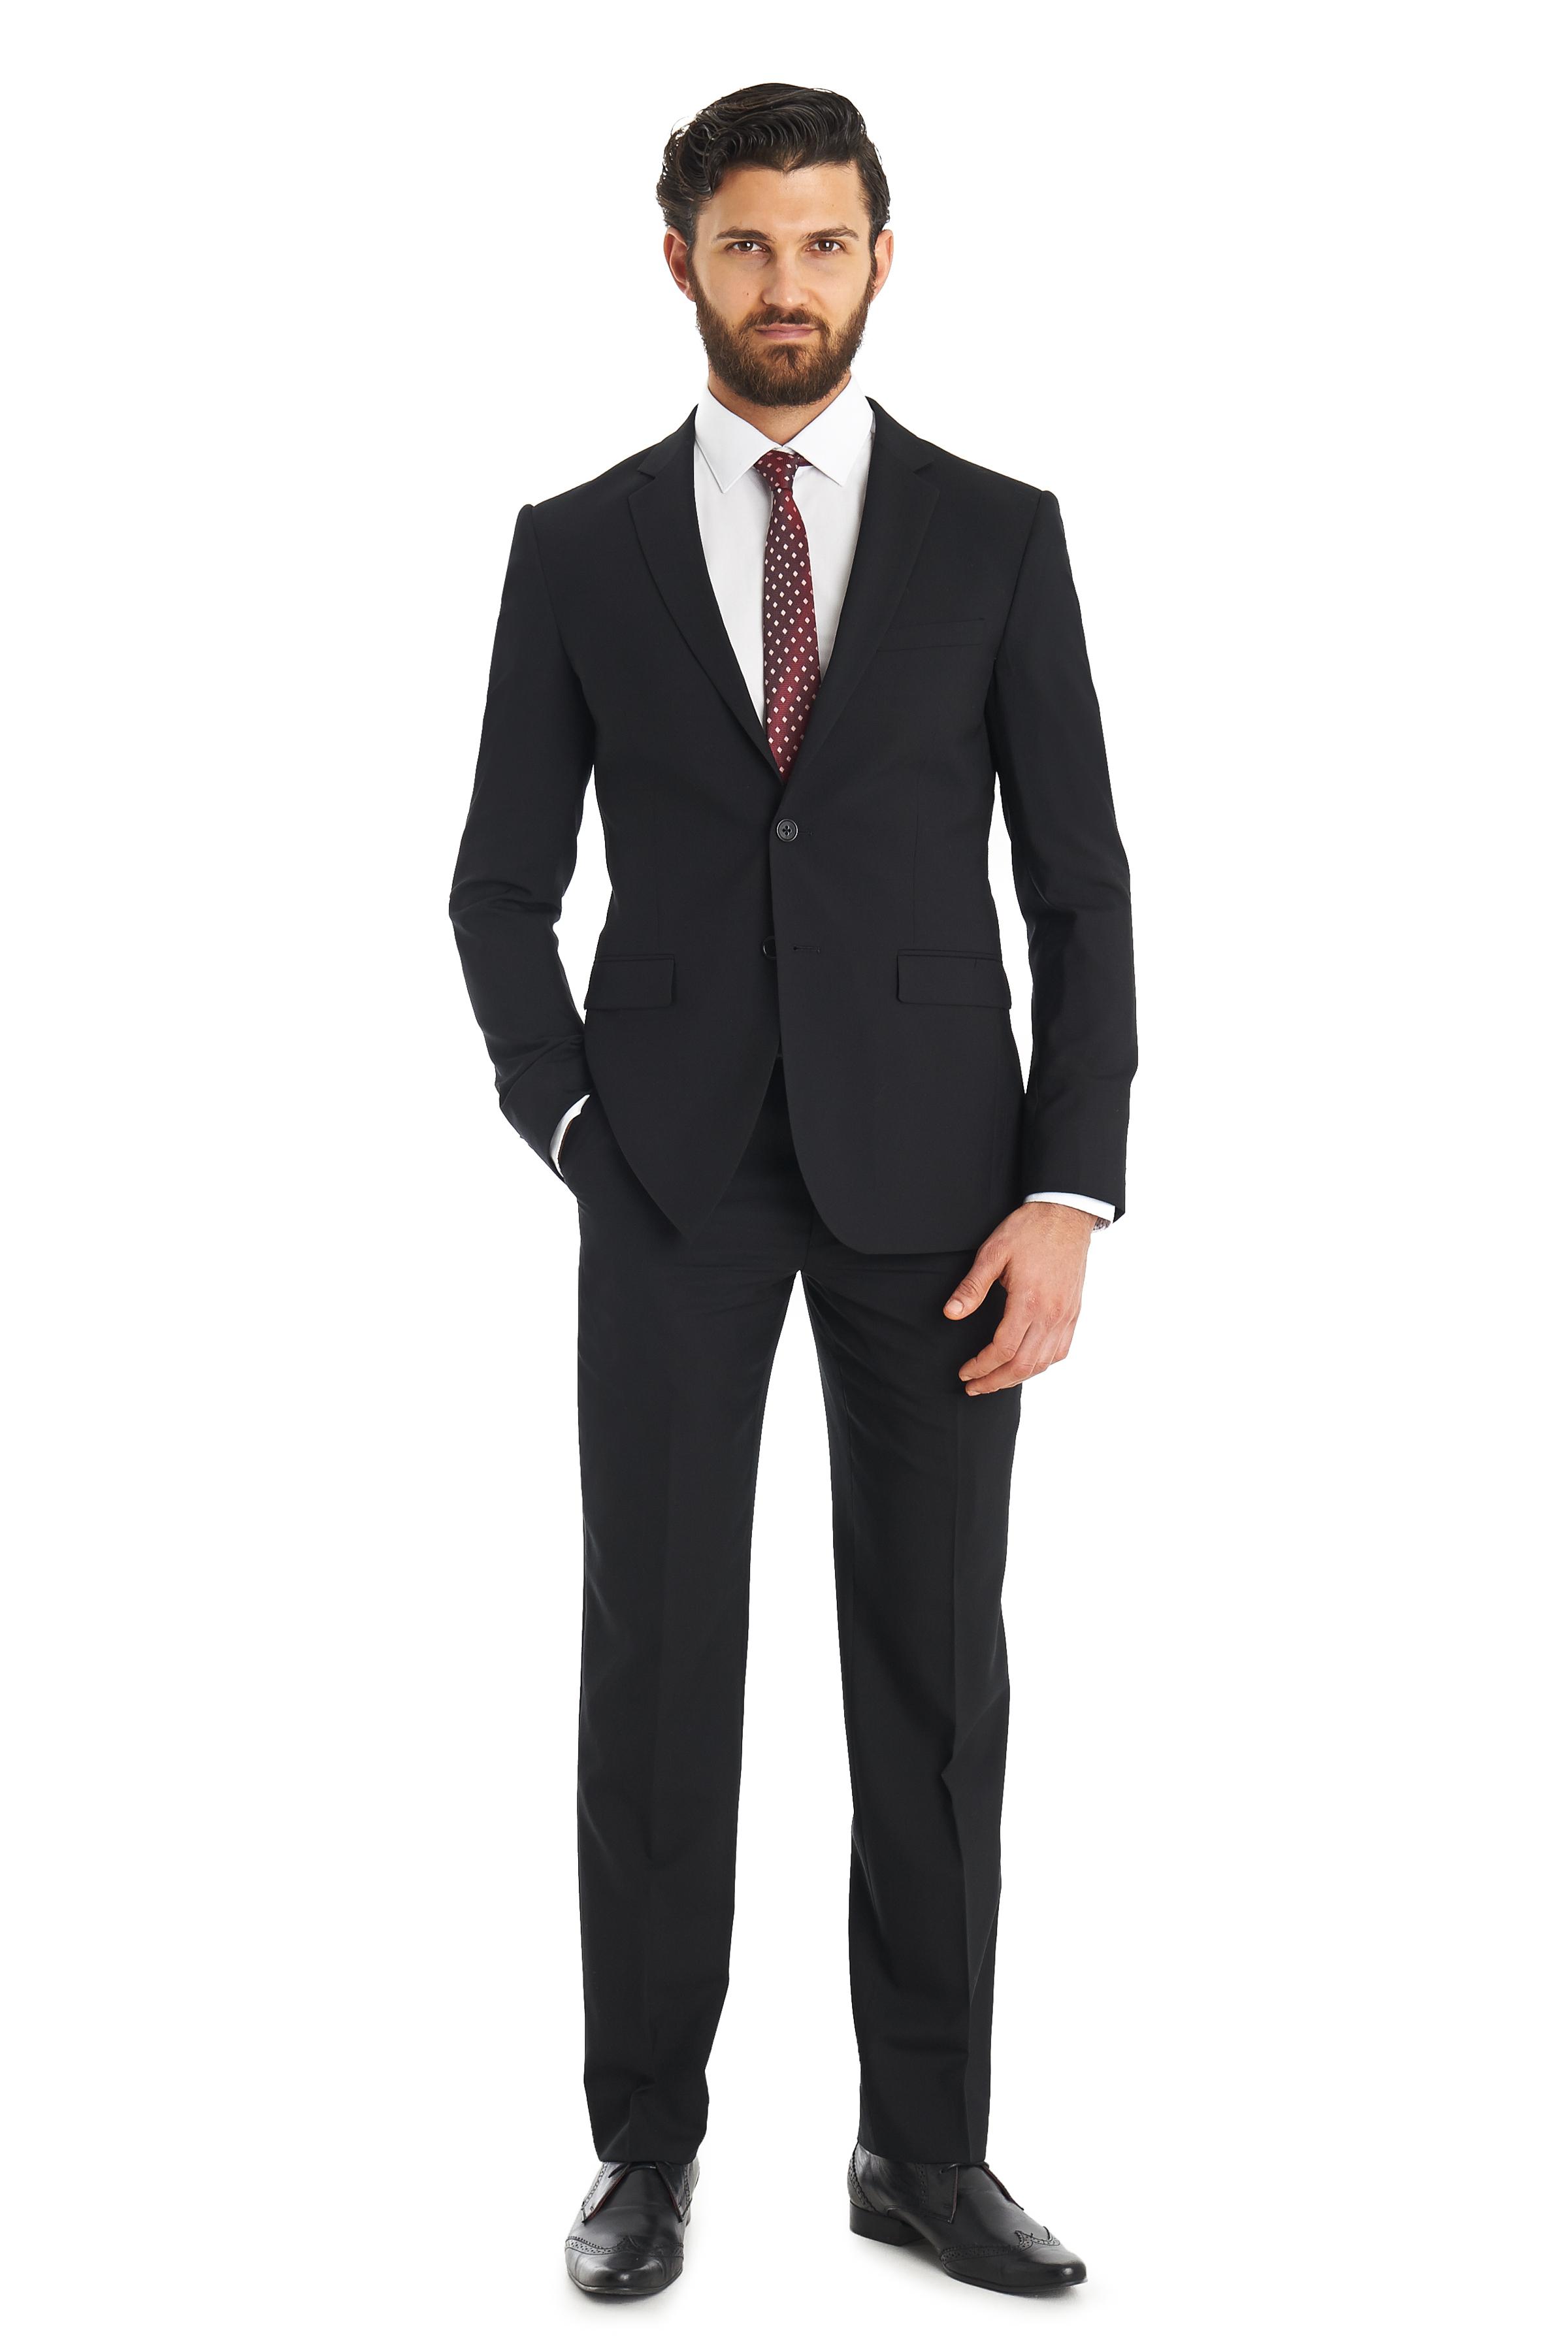 Lyst - Dkny Slim Fit Black 2 Piece Suit in Black for Men